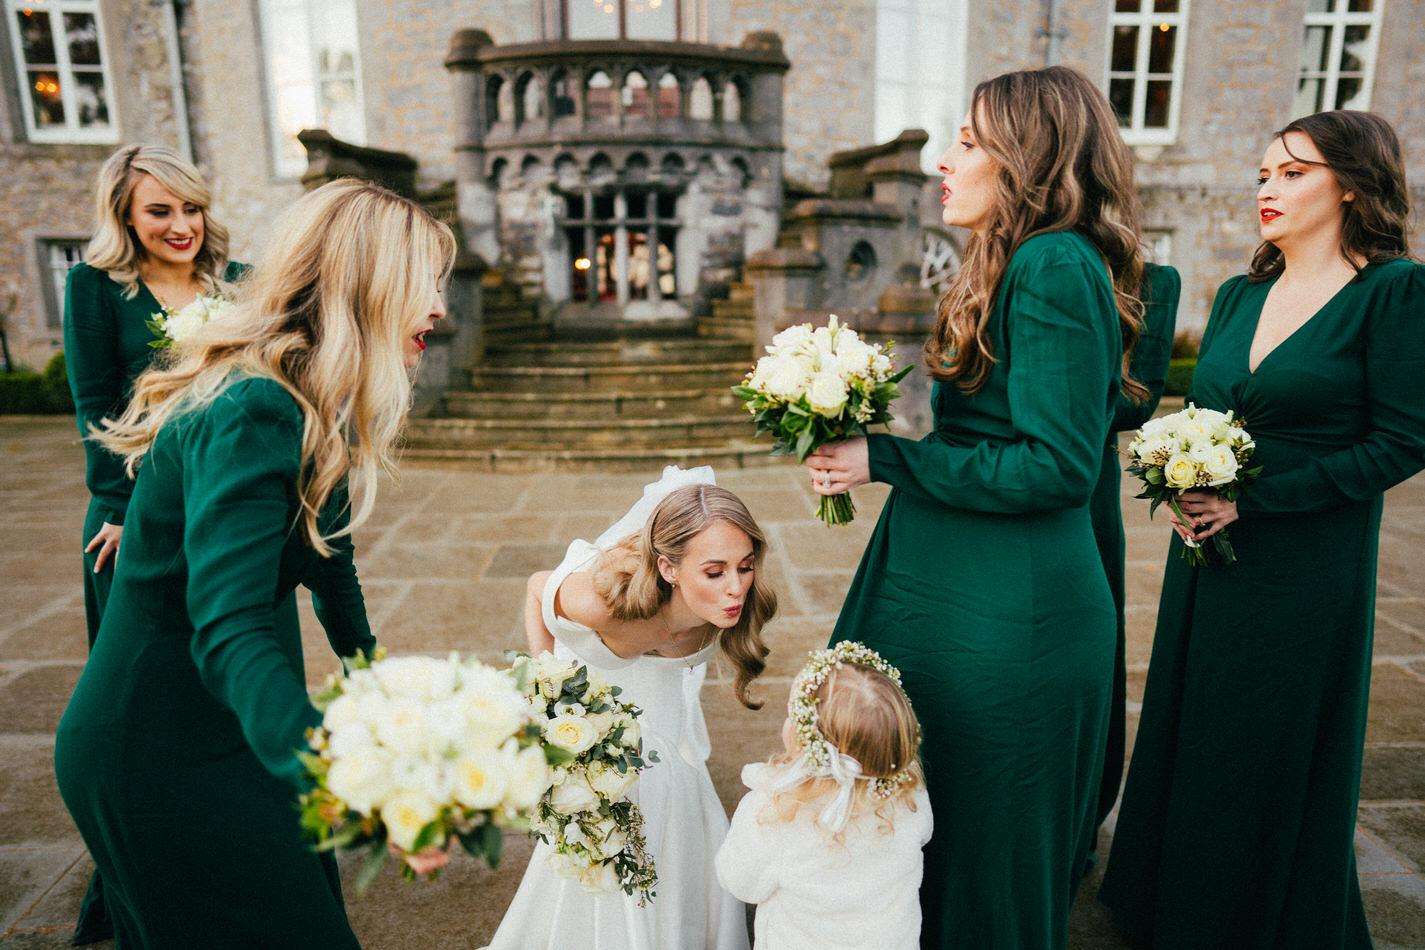 Castle-wedding-ireland-photos- 0214 154